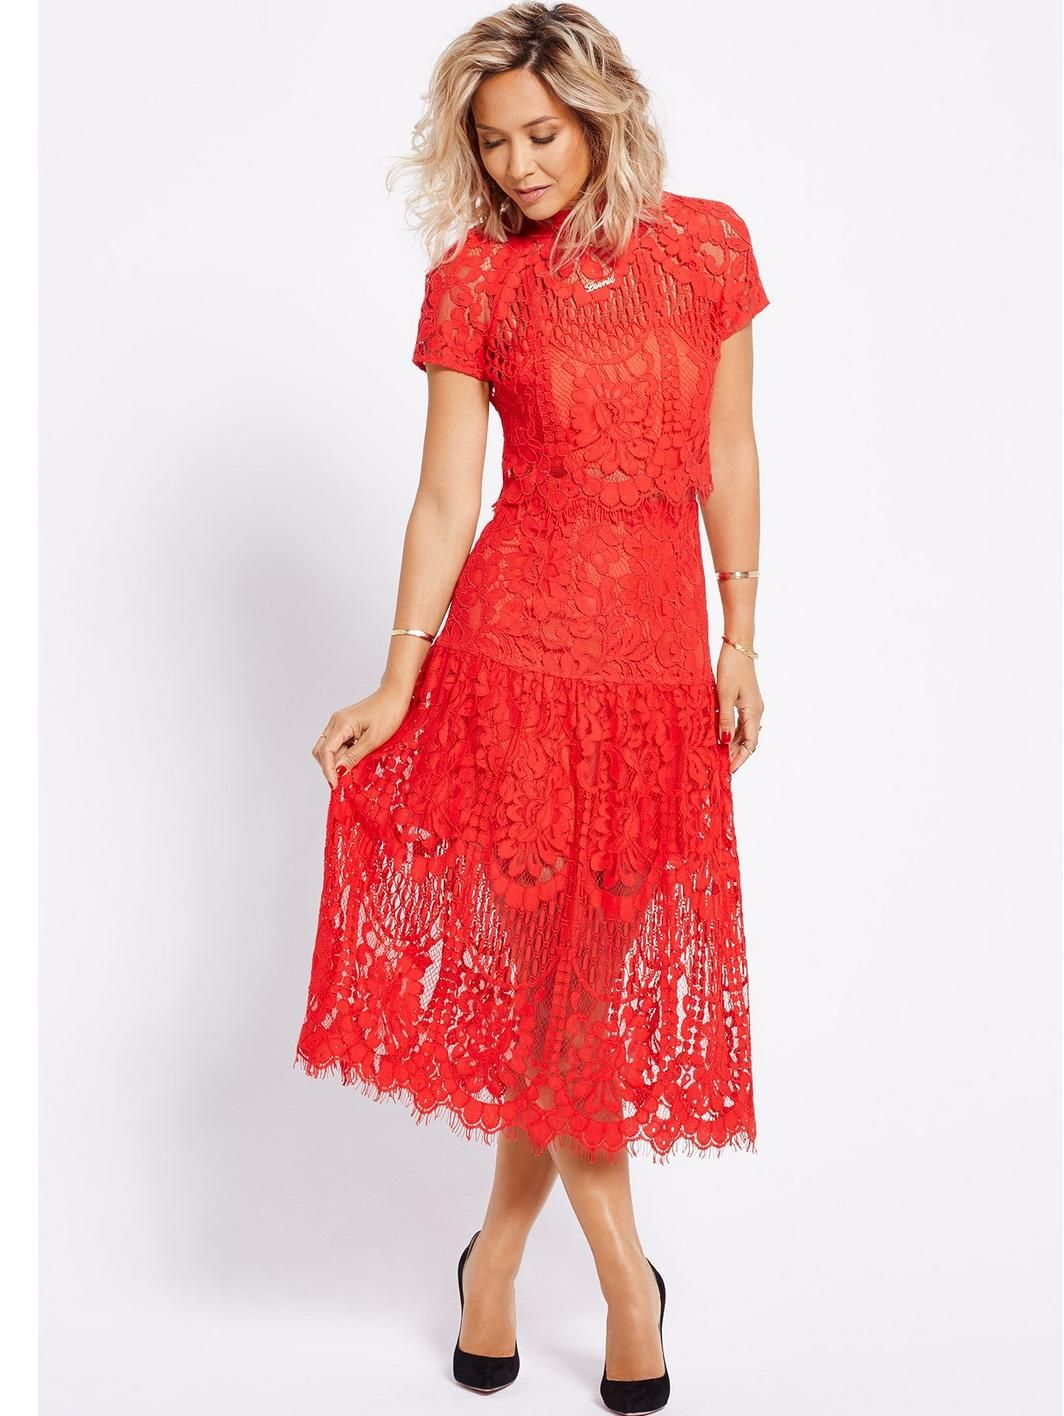 Littlewoods Ireland | Online Shopping | Fashion & Homeware. Lace Midi  DressDress RedFancy DressWomen's ...